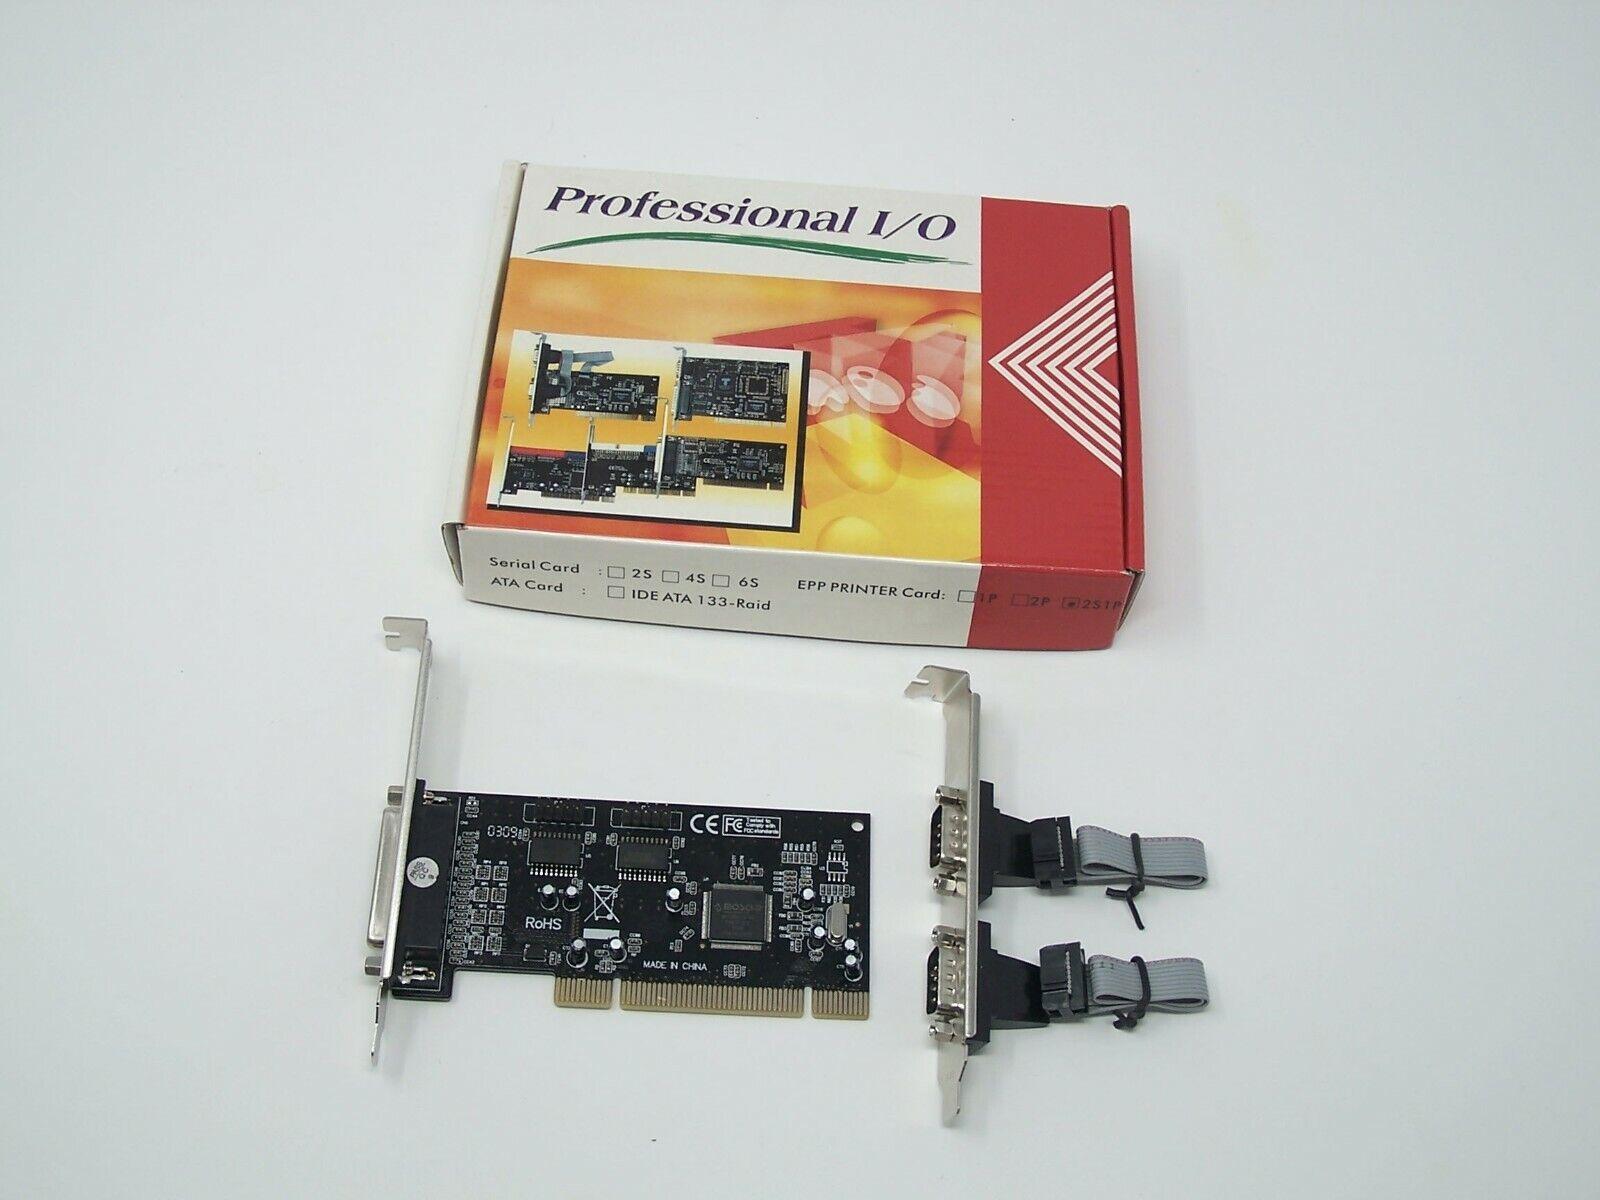 1-Port Parallel PCI Card GRBRENH 2-Port Serial